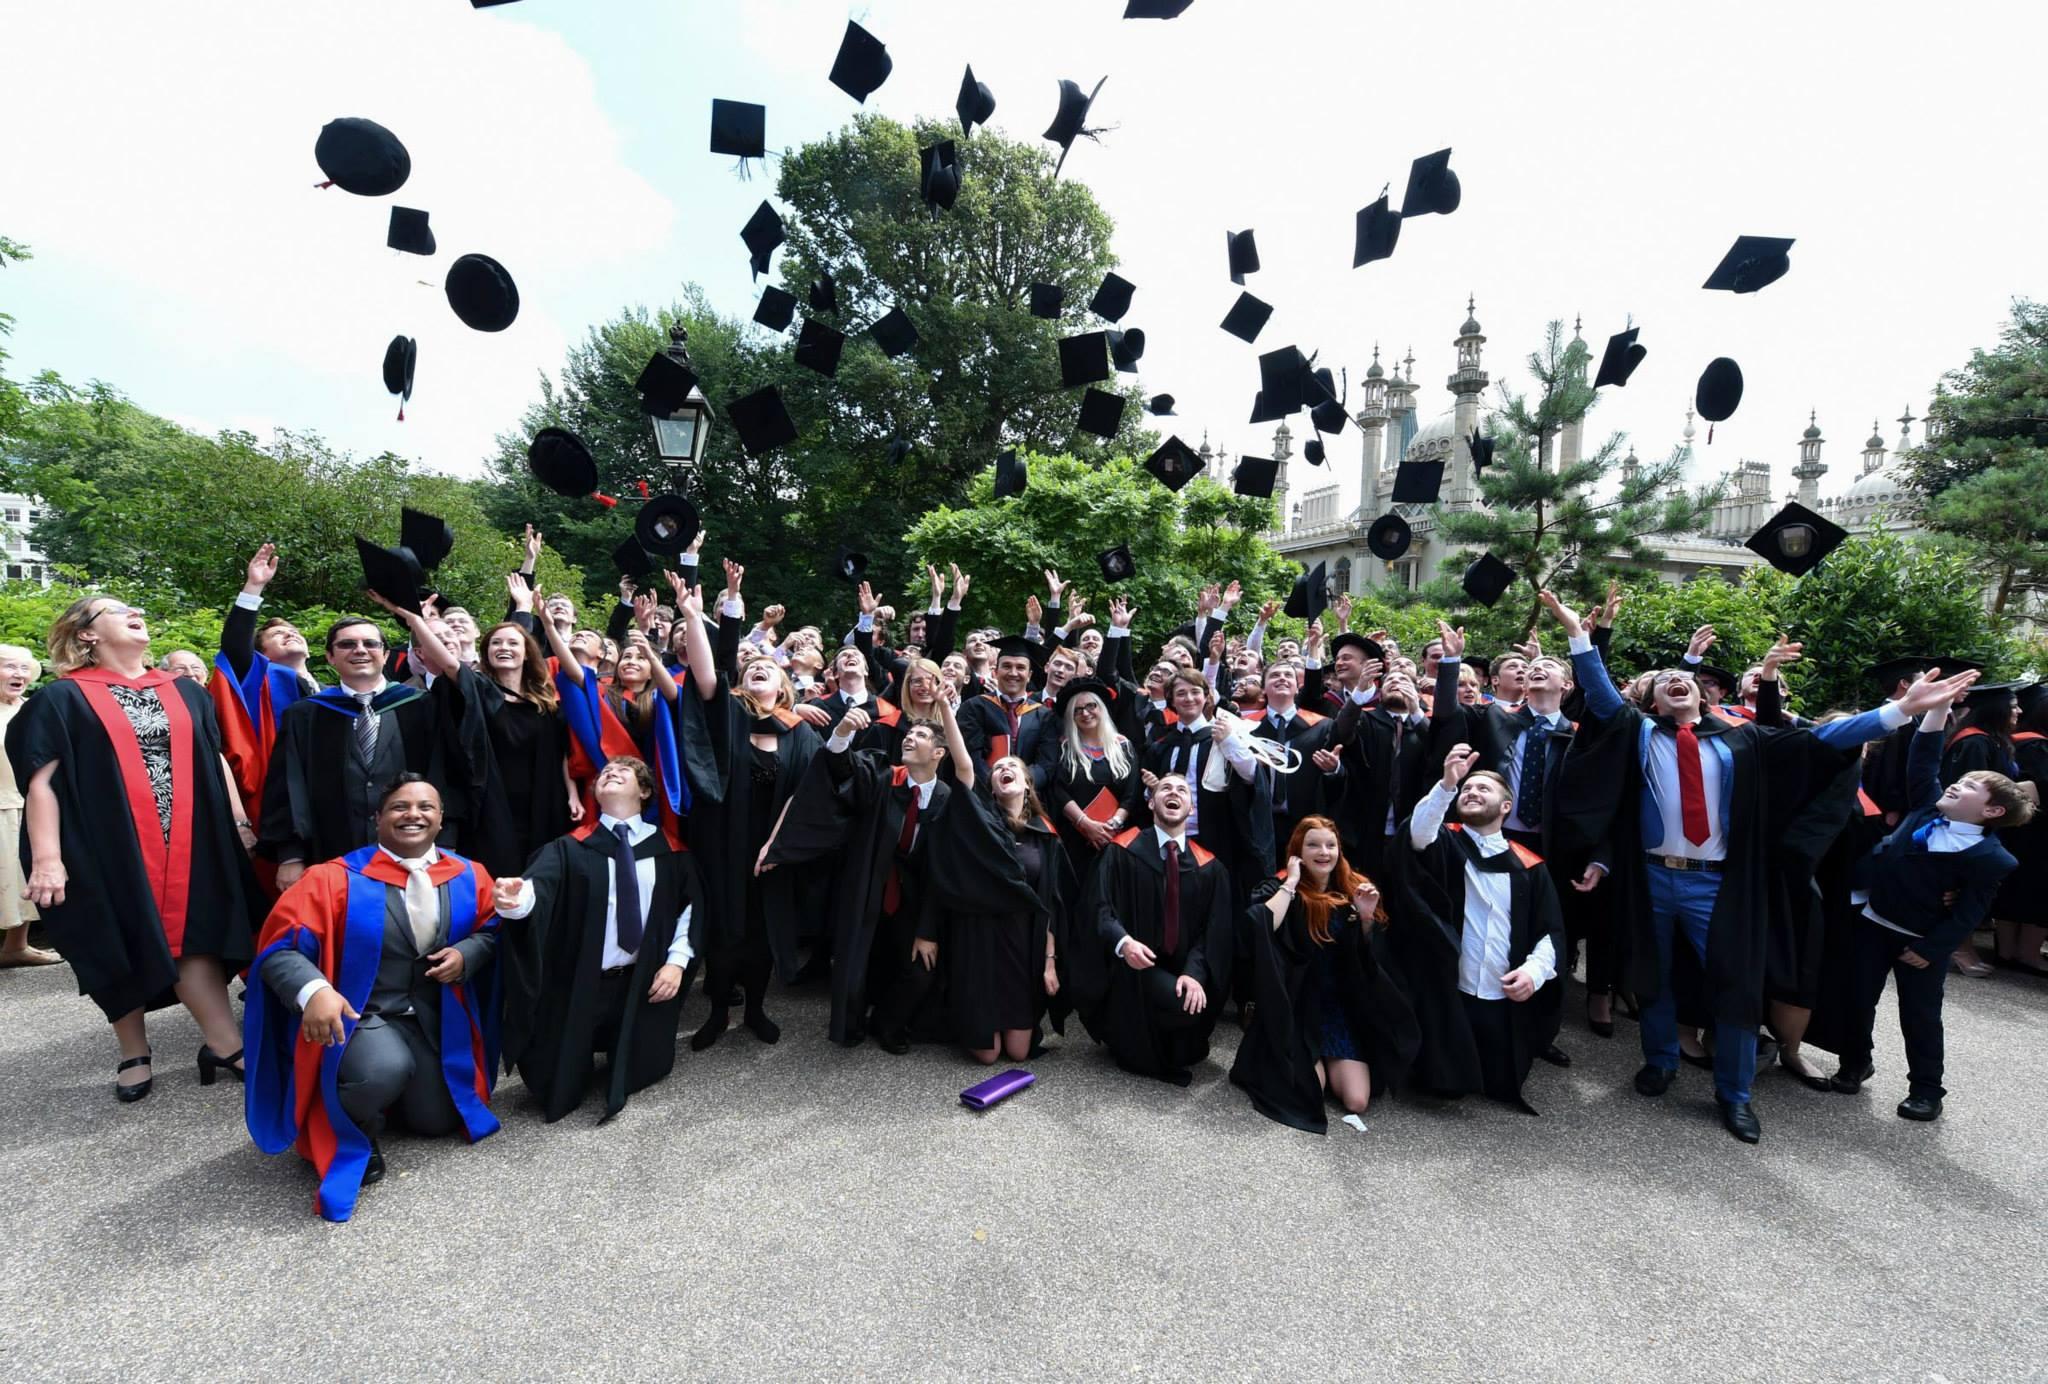 Gowns, Grammar and Graduation | In the Dark